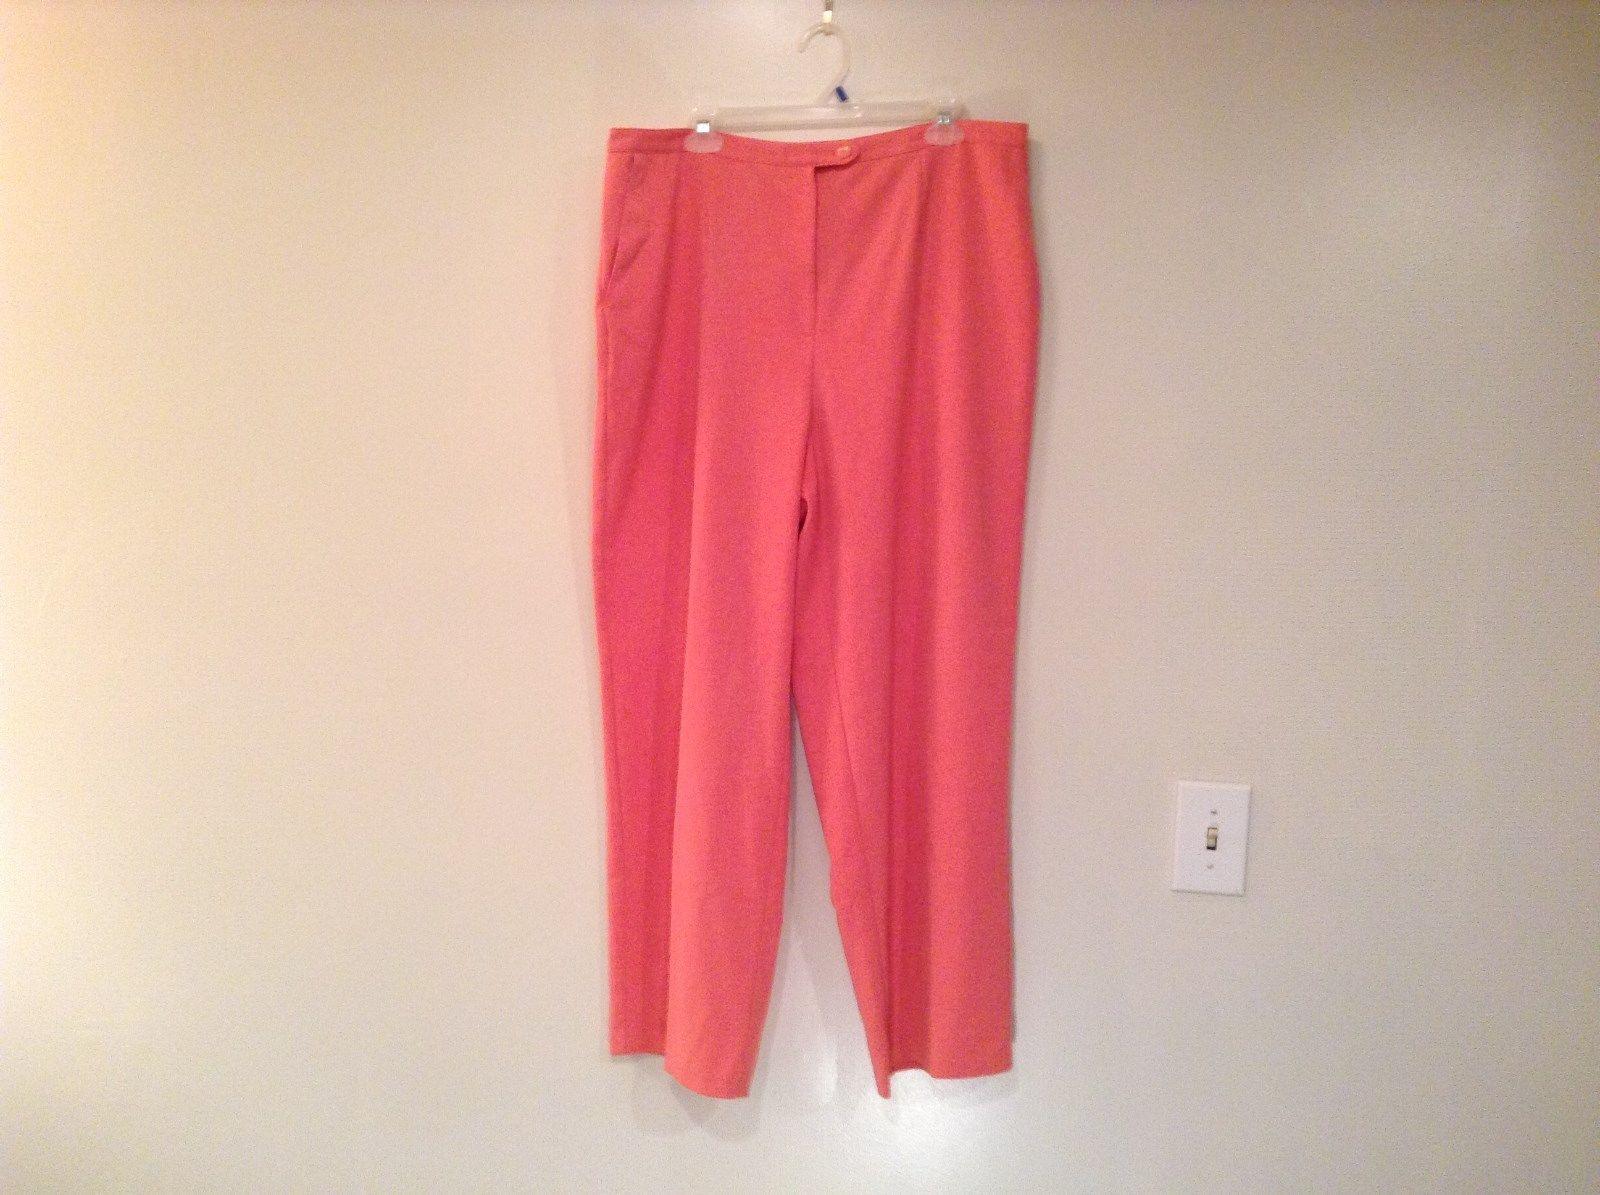 Light Pink Sag Harbor Stretch Casual Pants No Size Tag Measurements Below